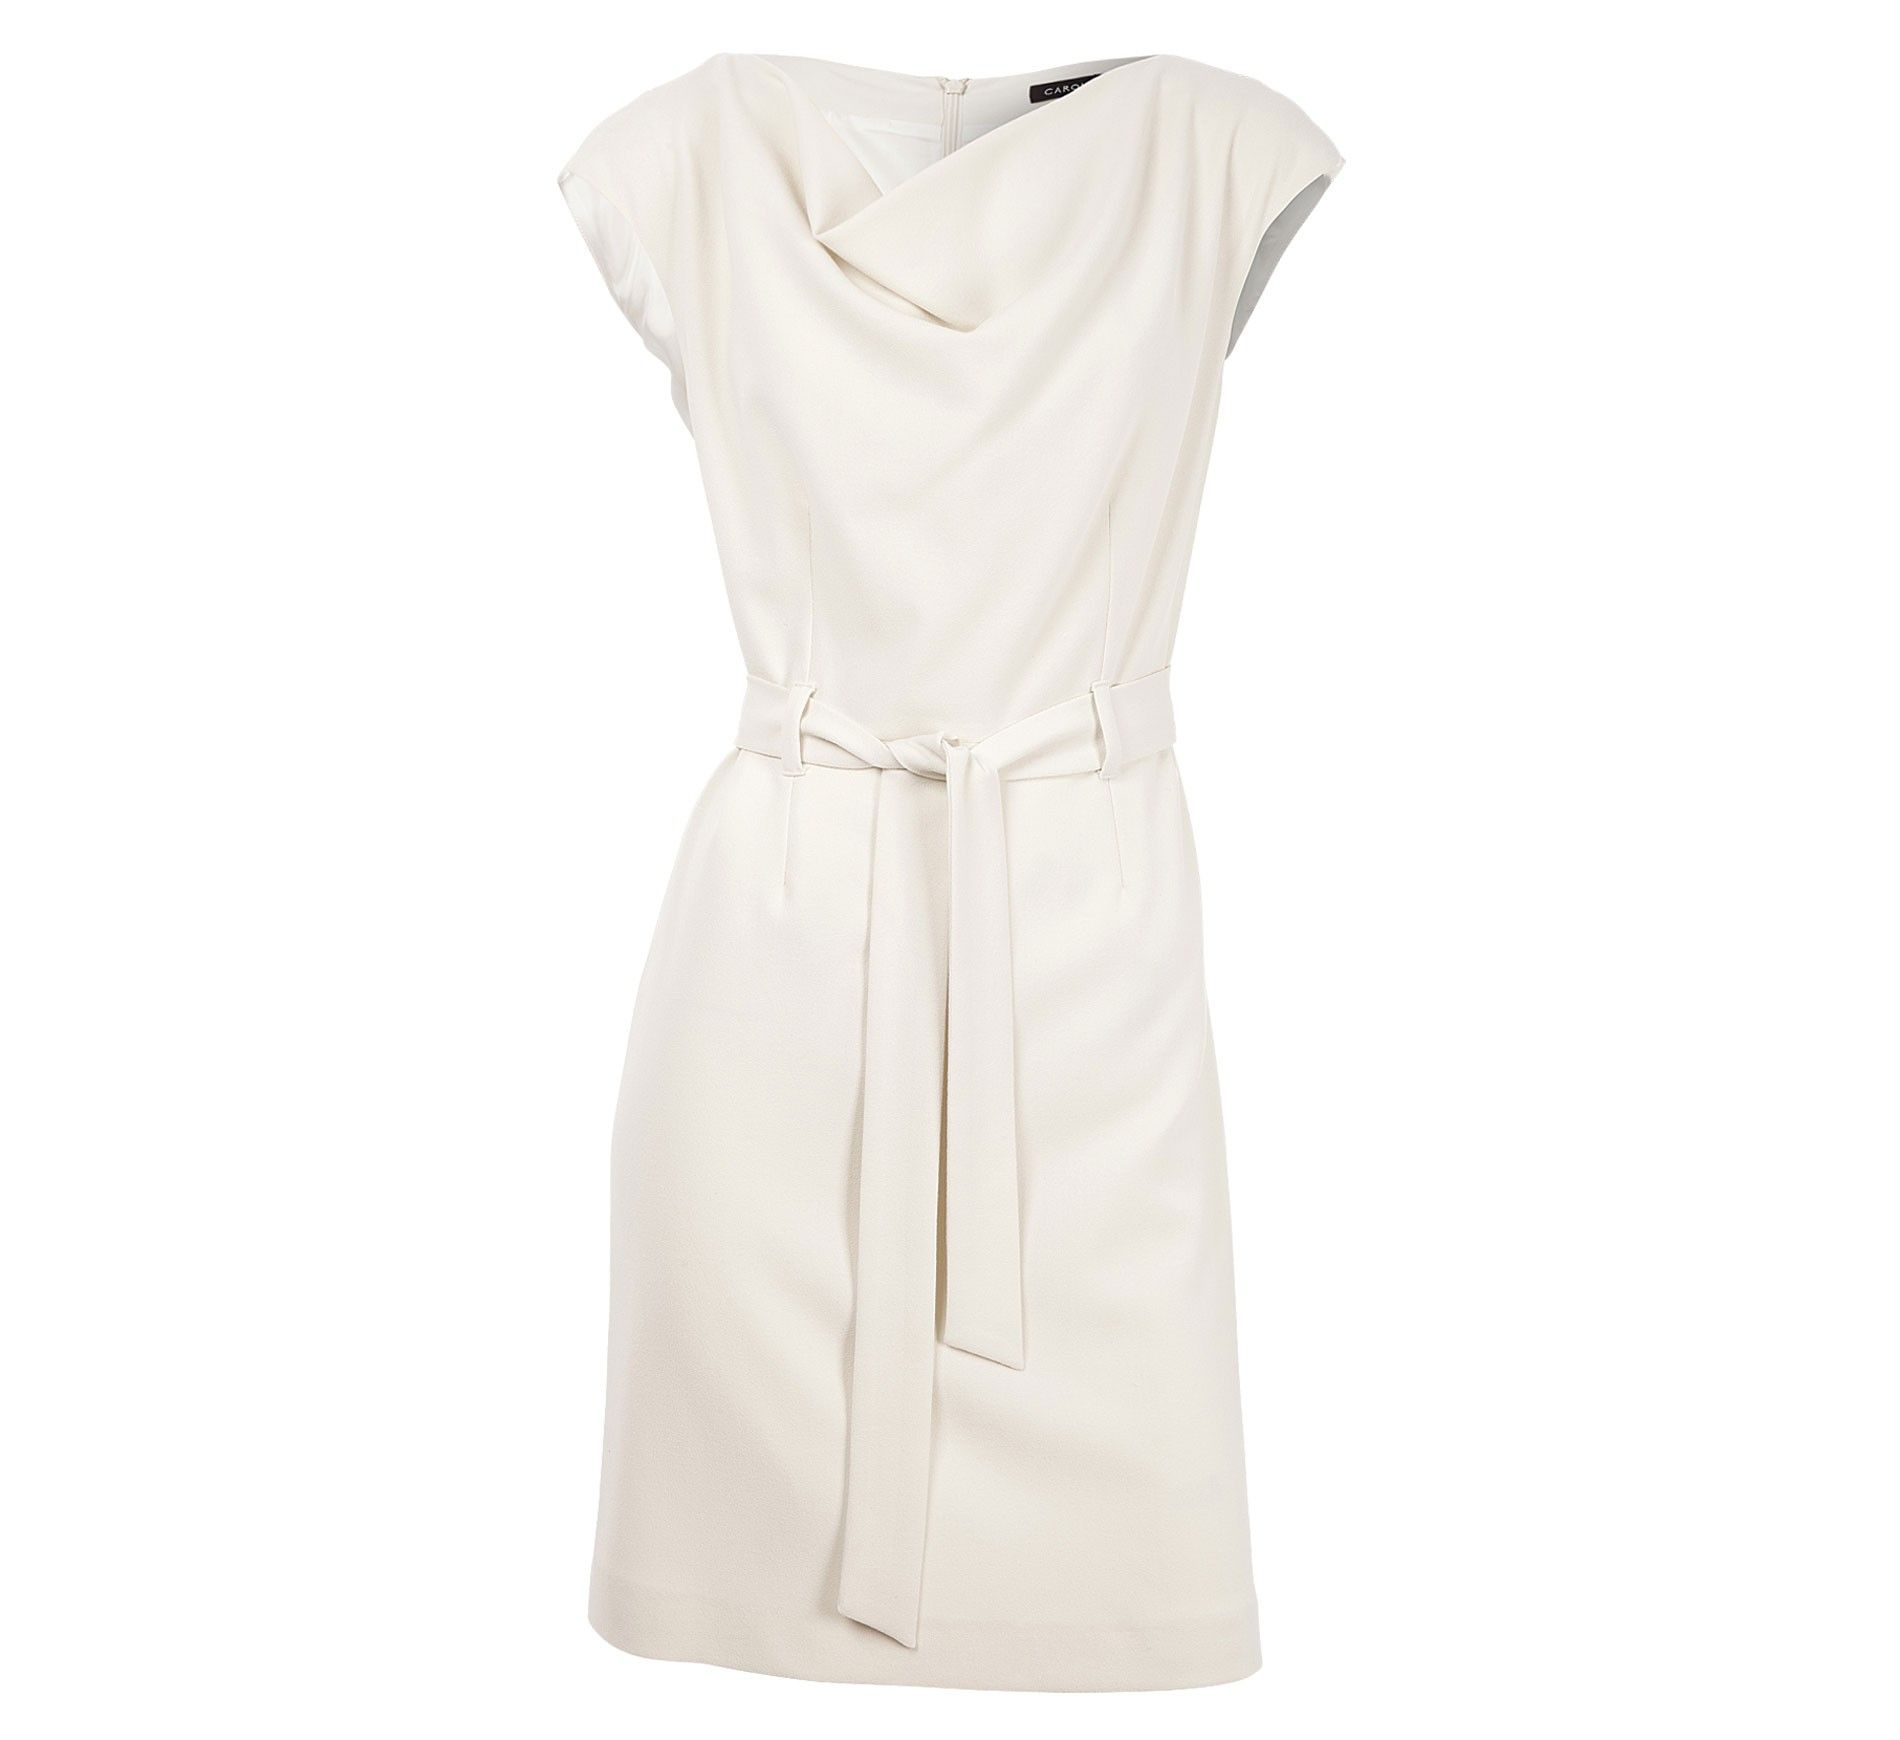 55bbaa37c39a0 caroll robe blanche   vêtement   Pinterest   Robe et Shopping